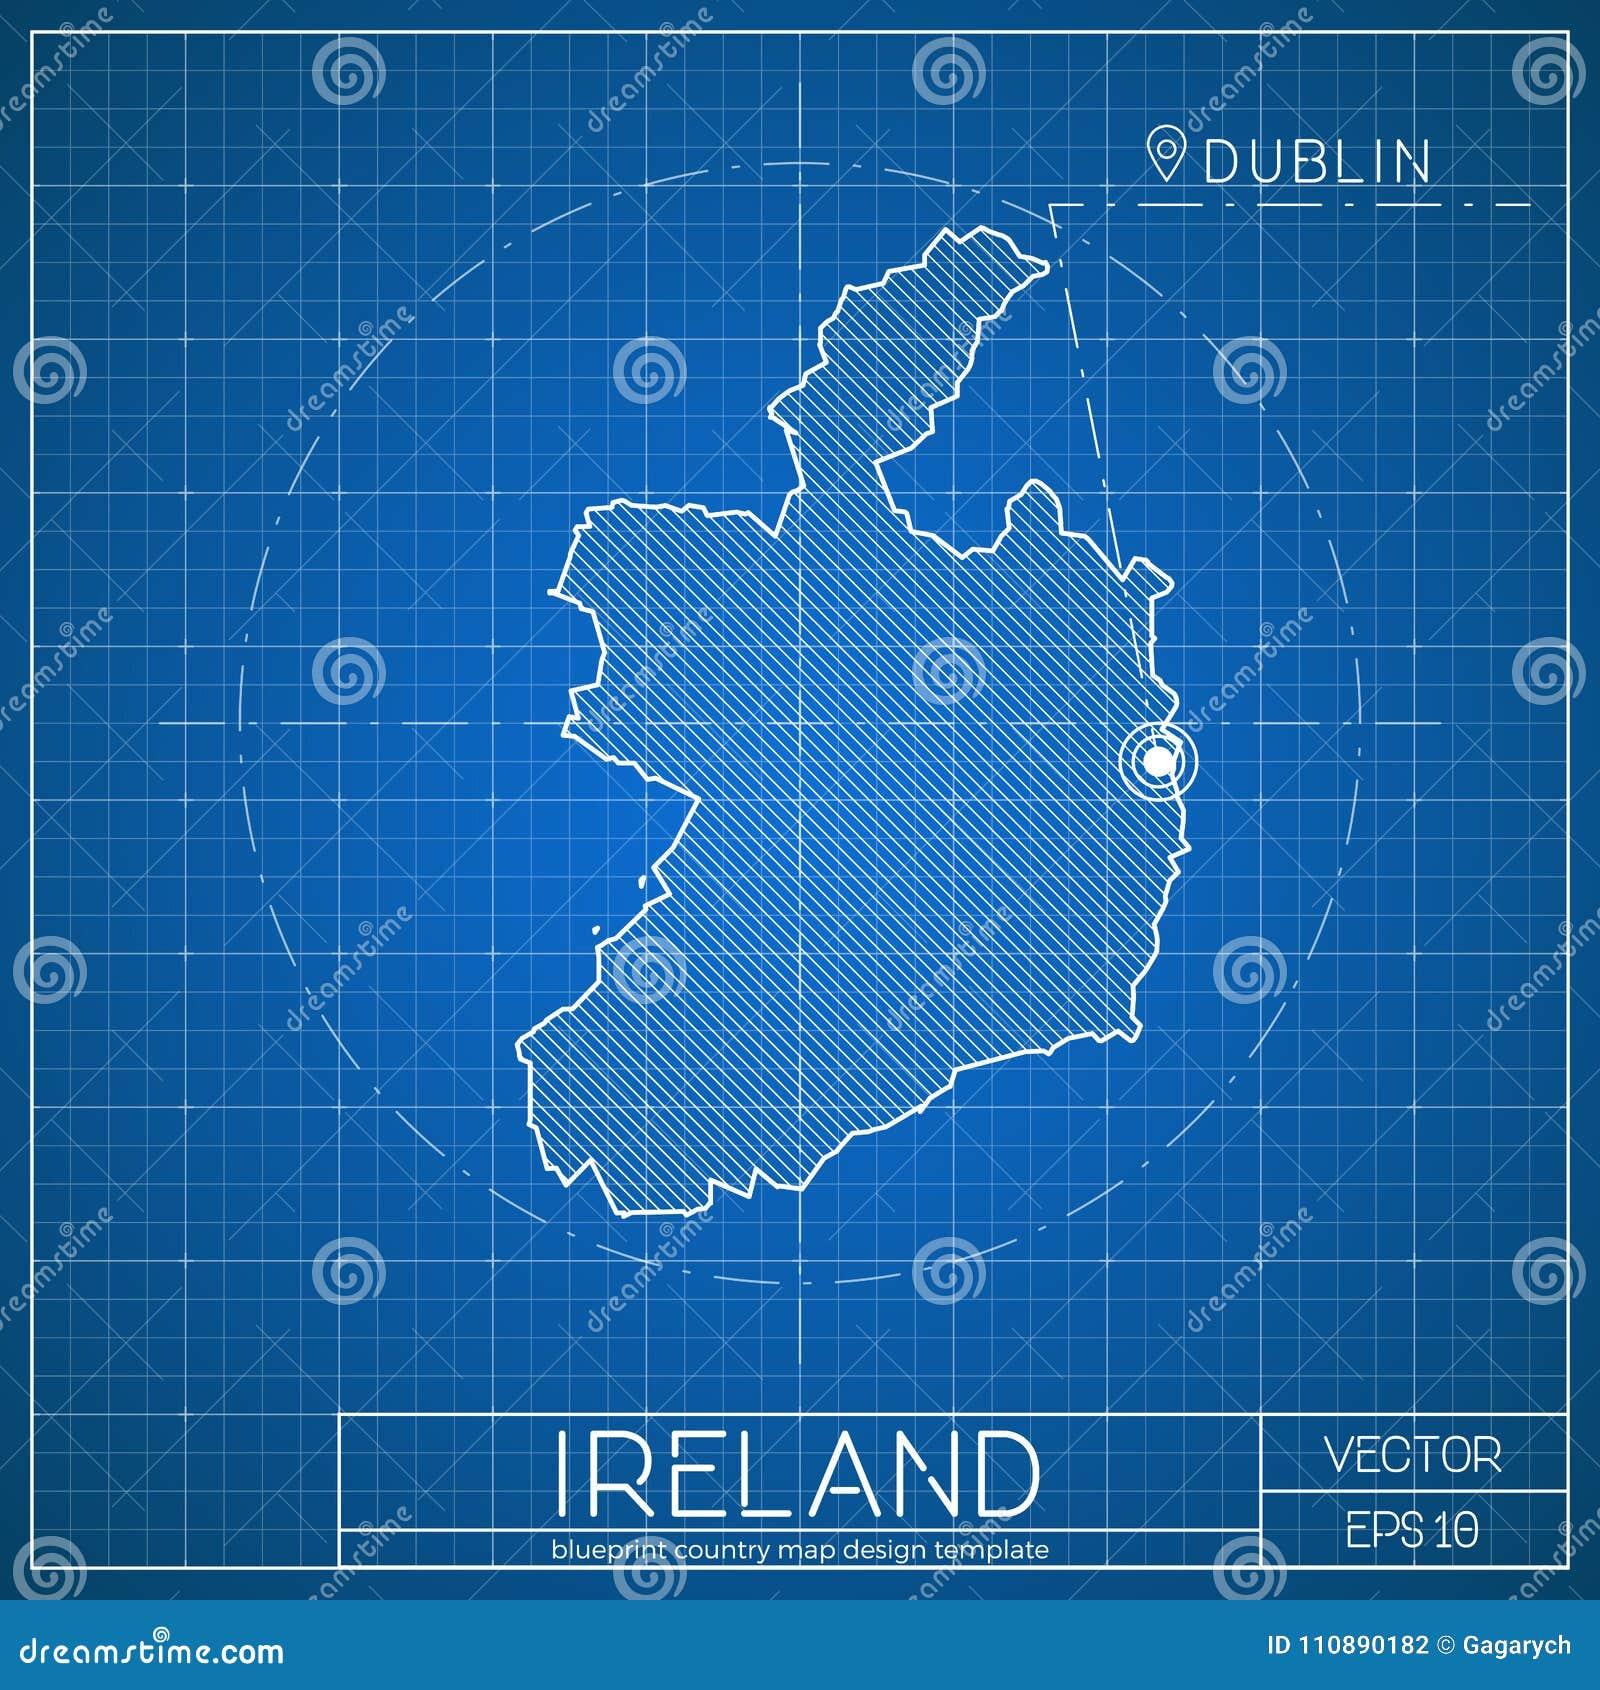 Ireland Blueprint Map Template With Capital City Stock Vector